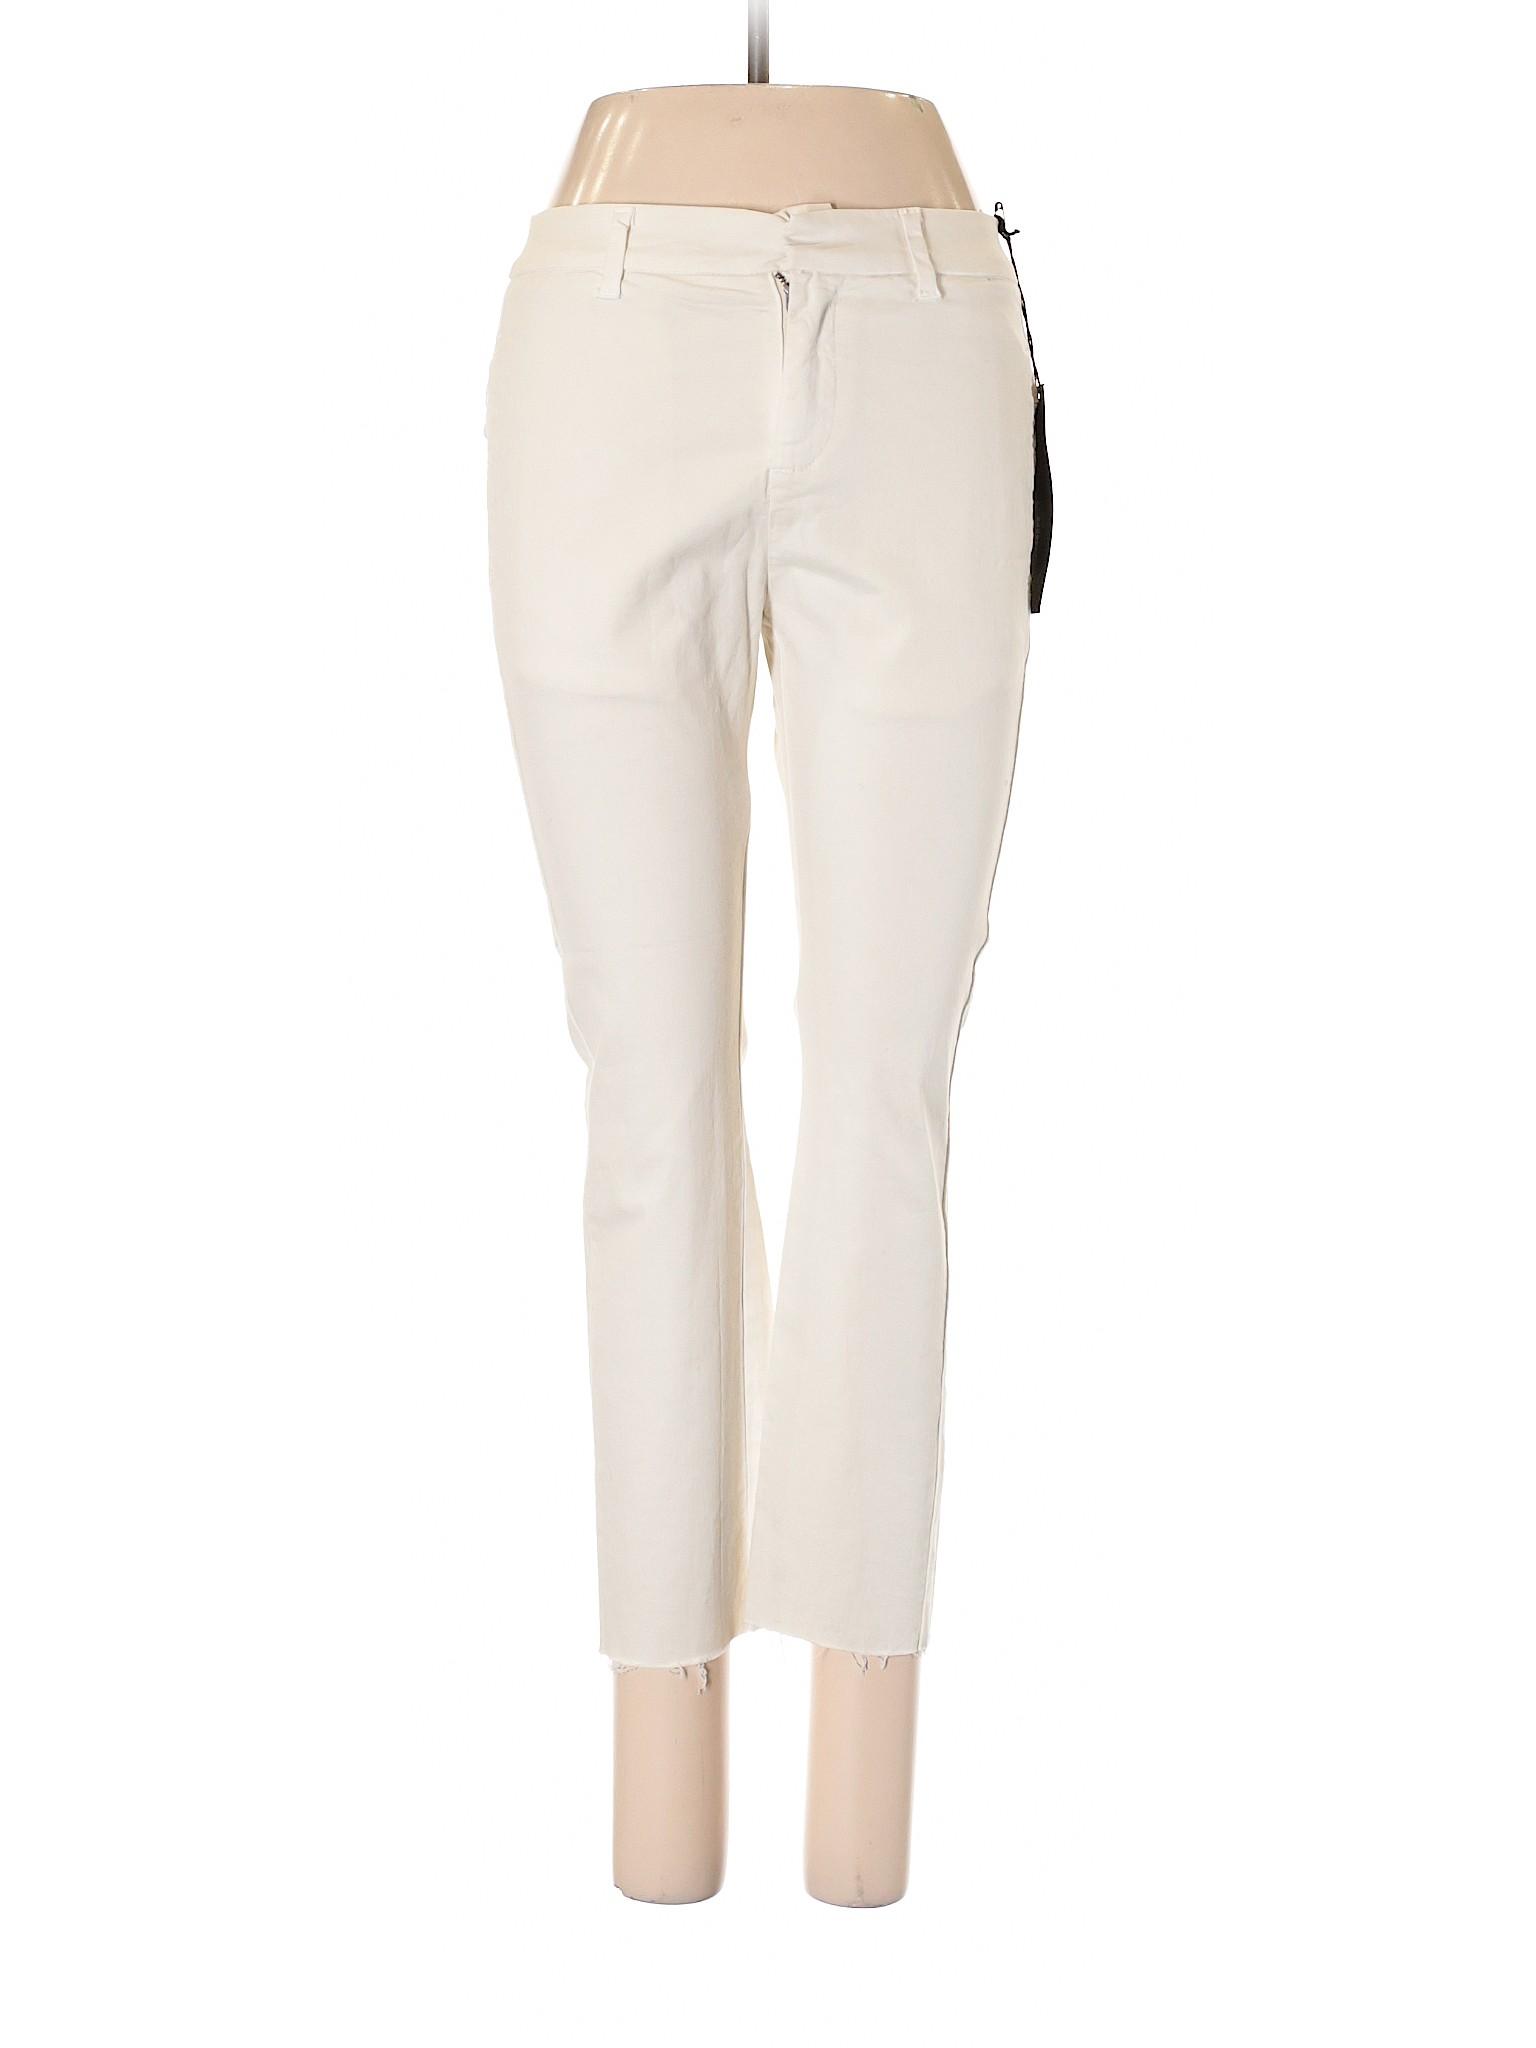 Boutique Casual Casual Lotan Nili Boutique Nili Pants Boutique Lotan Casual Nili Lotan Pants EEqwafyPK